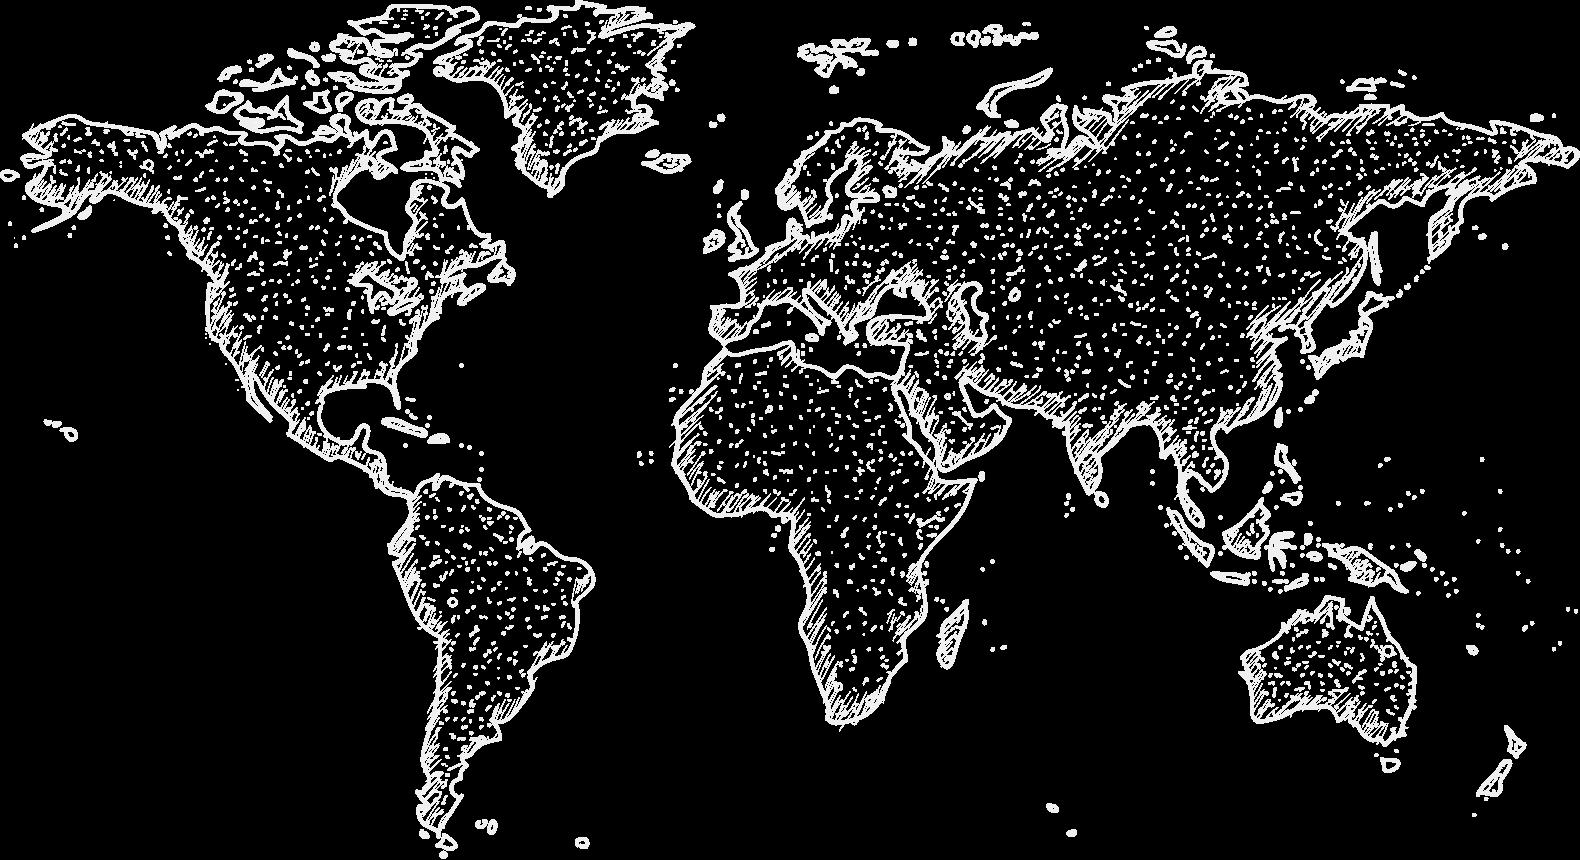 ipify - A Simple Public IP Address API